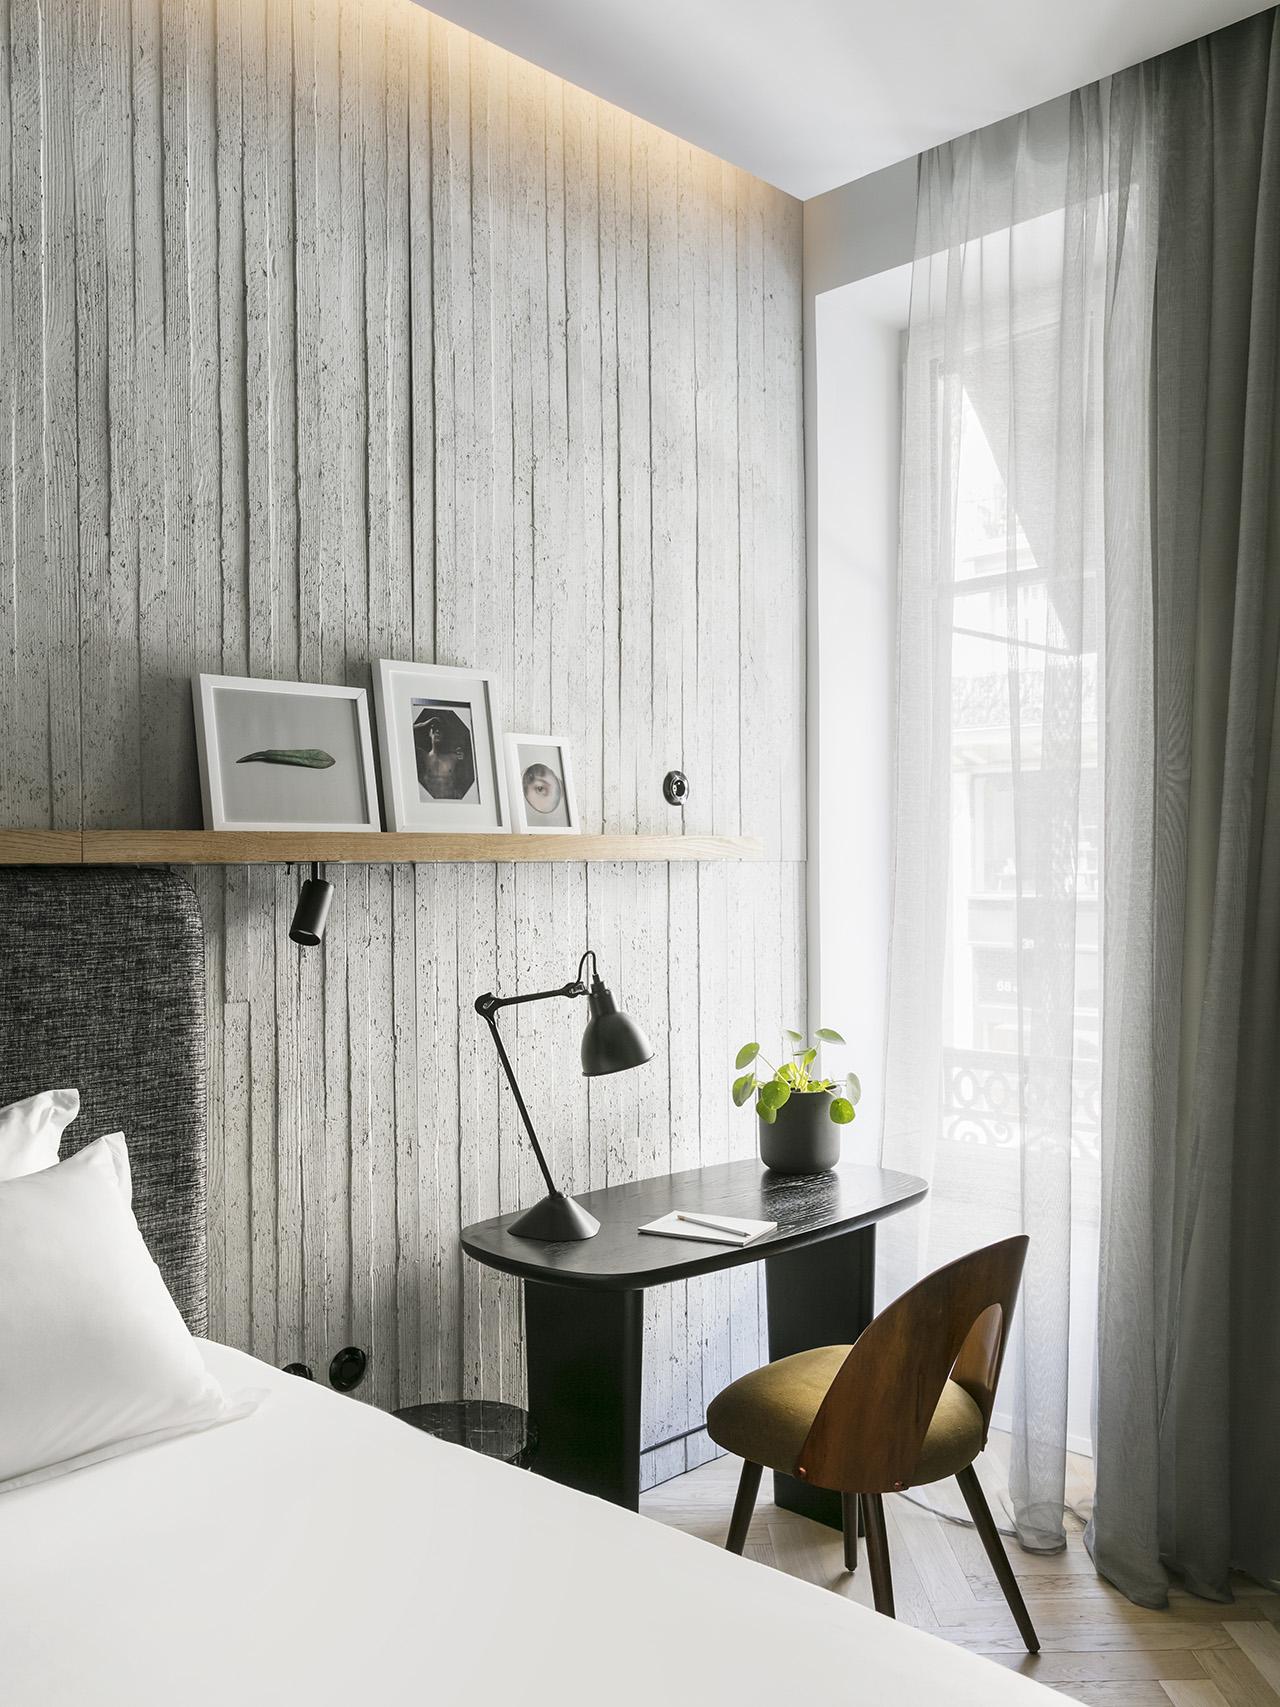 Hotel National des Arts et Metiers feature on Pendulum Magazine